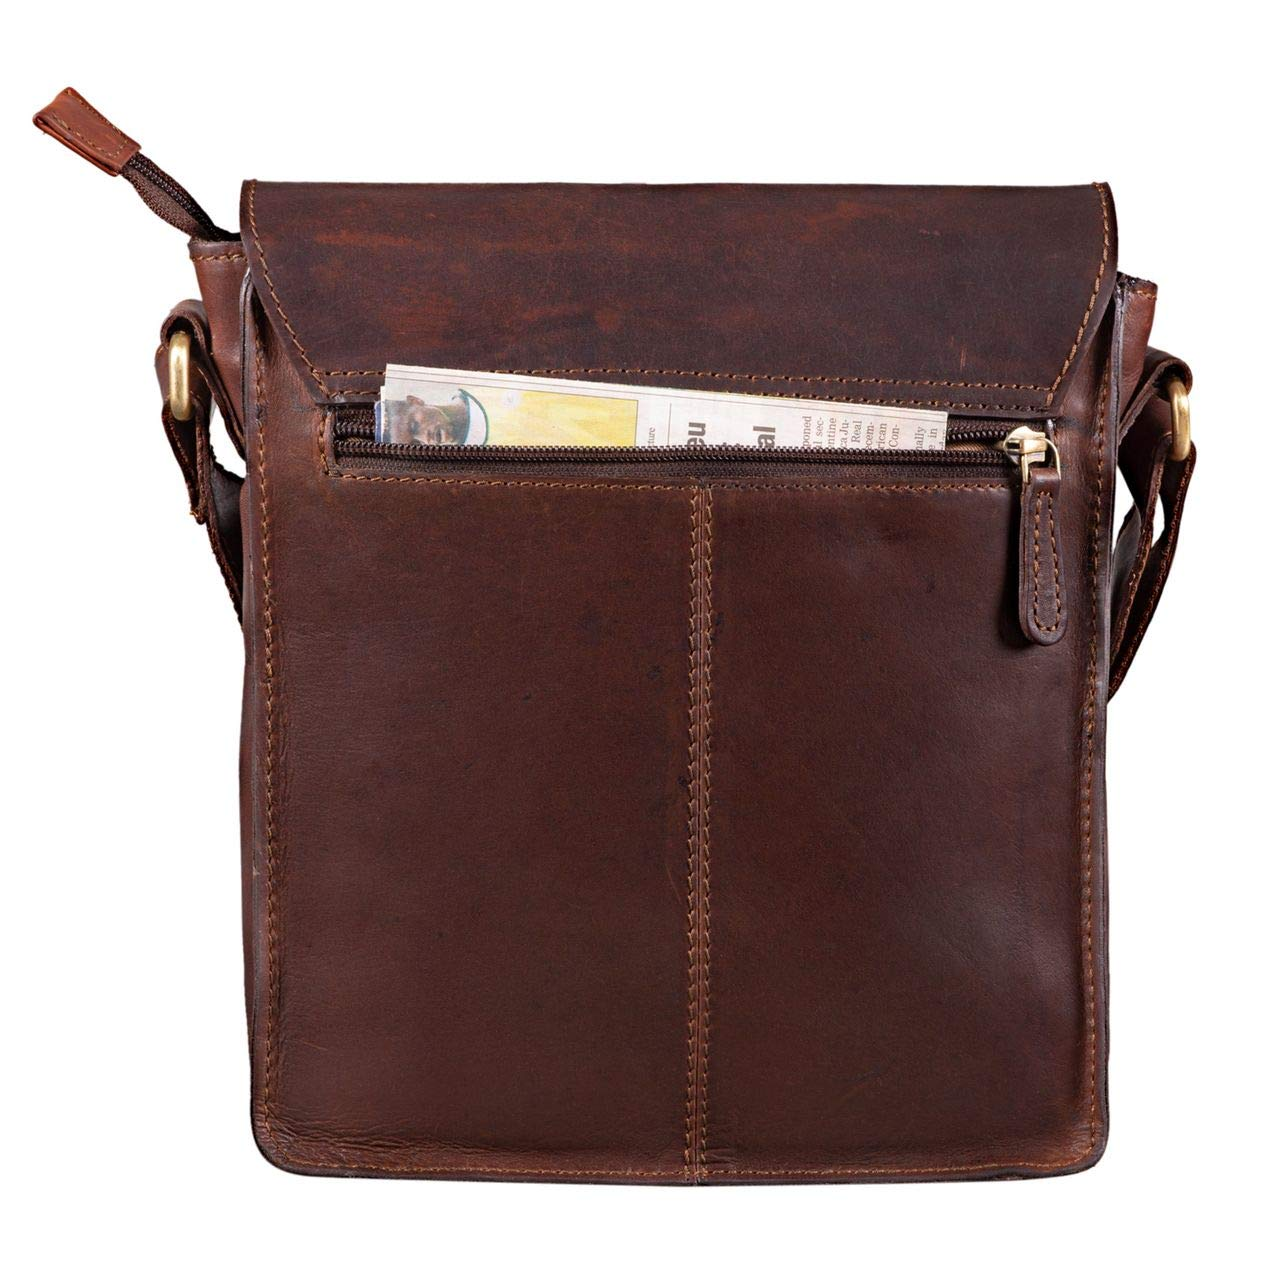 Color:Cognac marr/ón Oscuro STILORD Cliff Peque/ño Bolso Mensajero Hombre Cuero Bolso de Hombro Masculino Bolsa Tablet de iPad 9,7 Pulgadas Bolso Bandolera de Piel